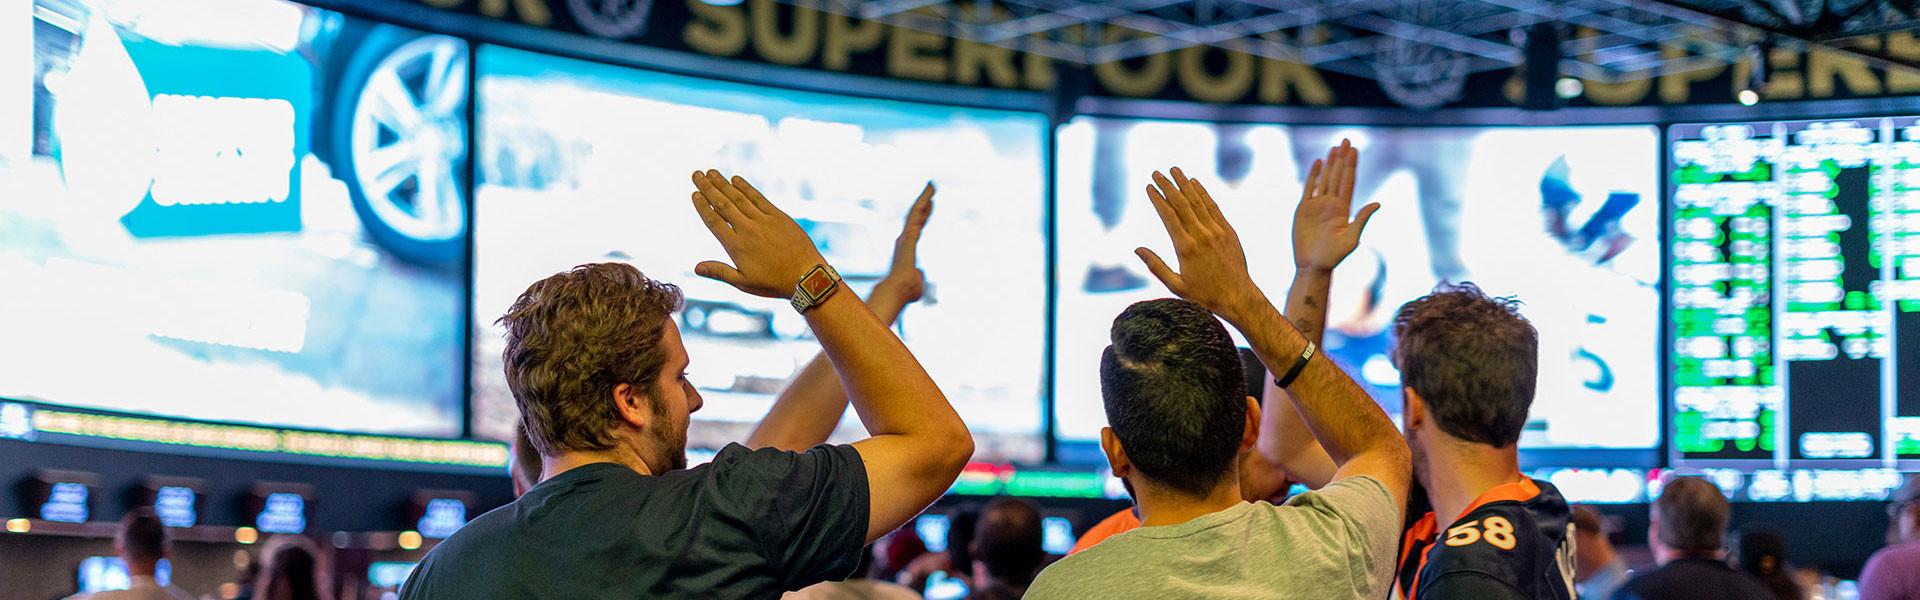 Inside our Sports Superbook | Menu For The Race & SportsBook (Superbook) | Westgate Las Vegas Resort & Casino